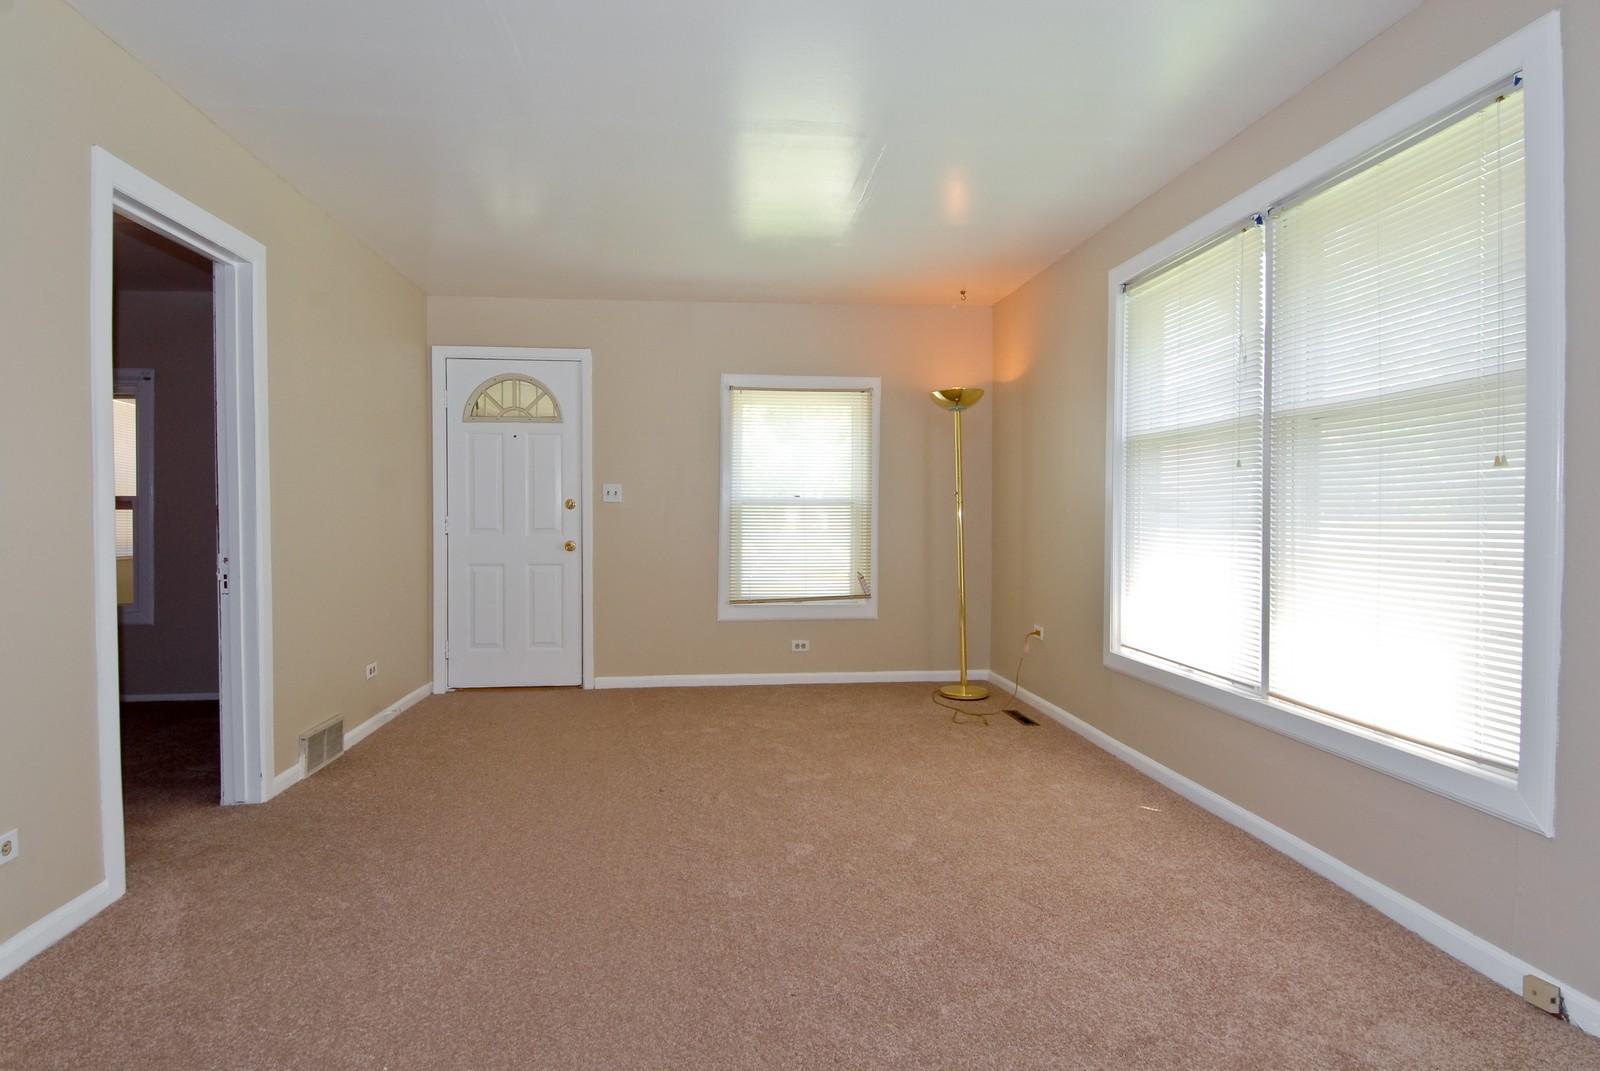 Real Estate Photography - 730 Hammond, Aurora, IL, 60506 - Living Room